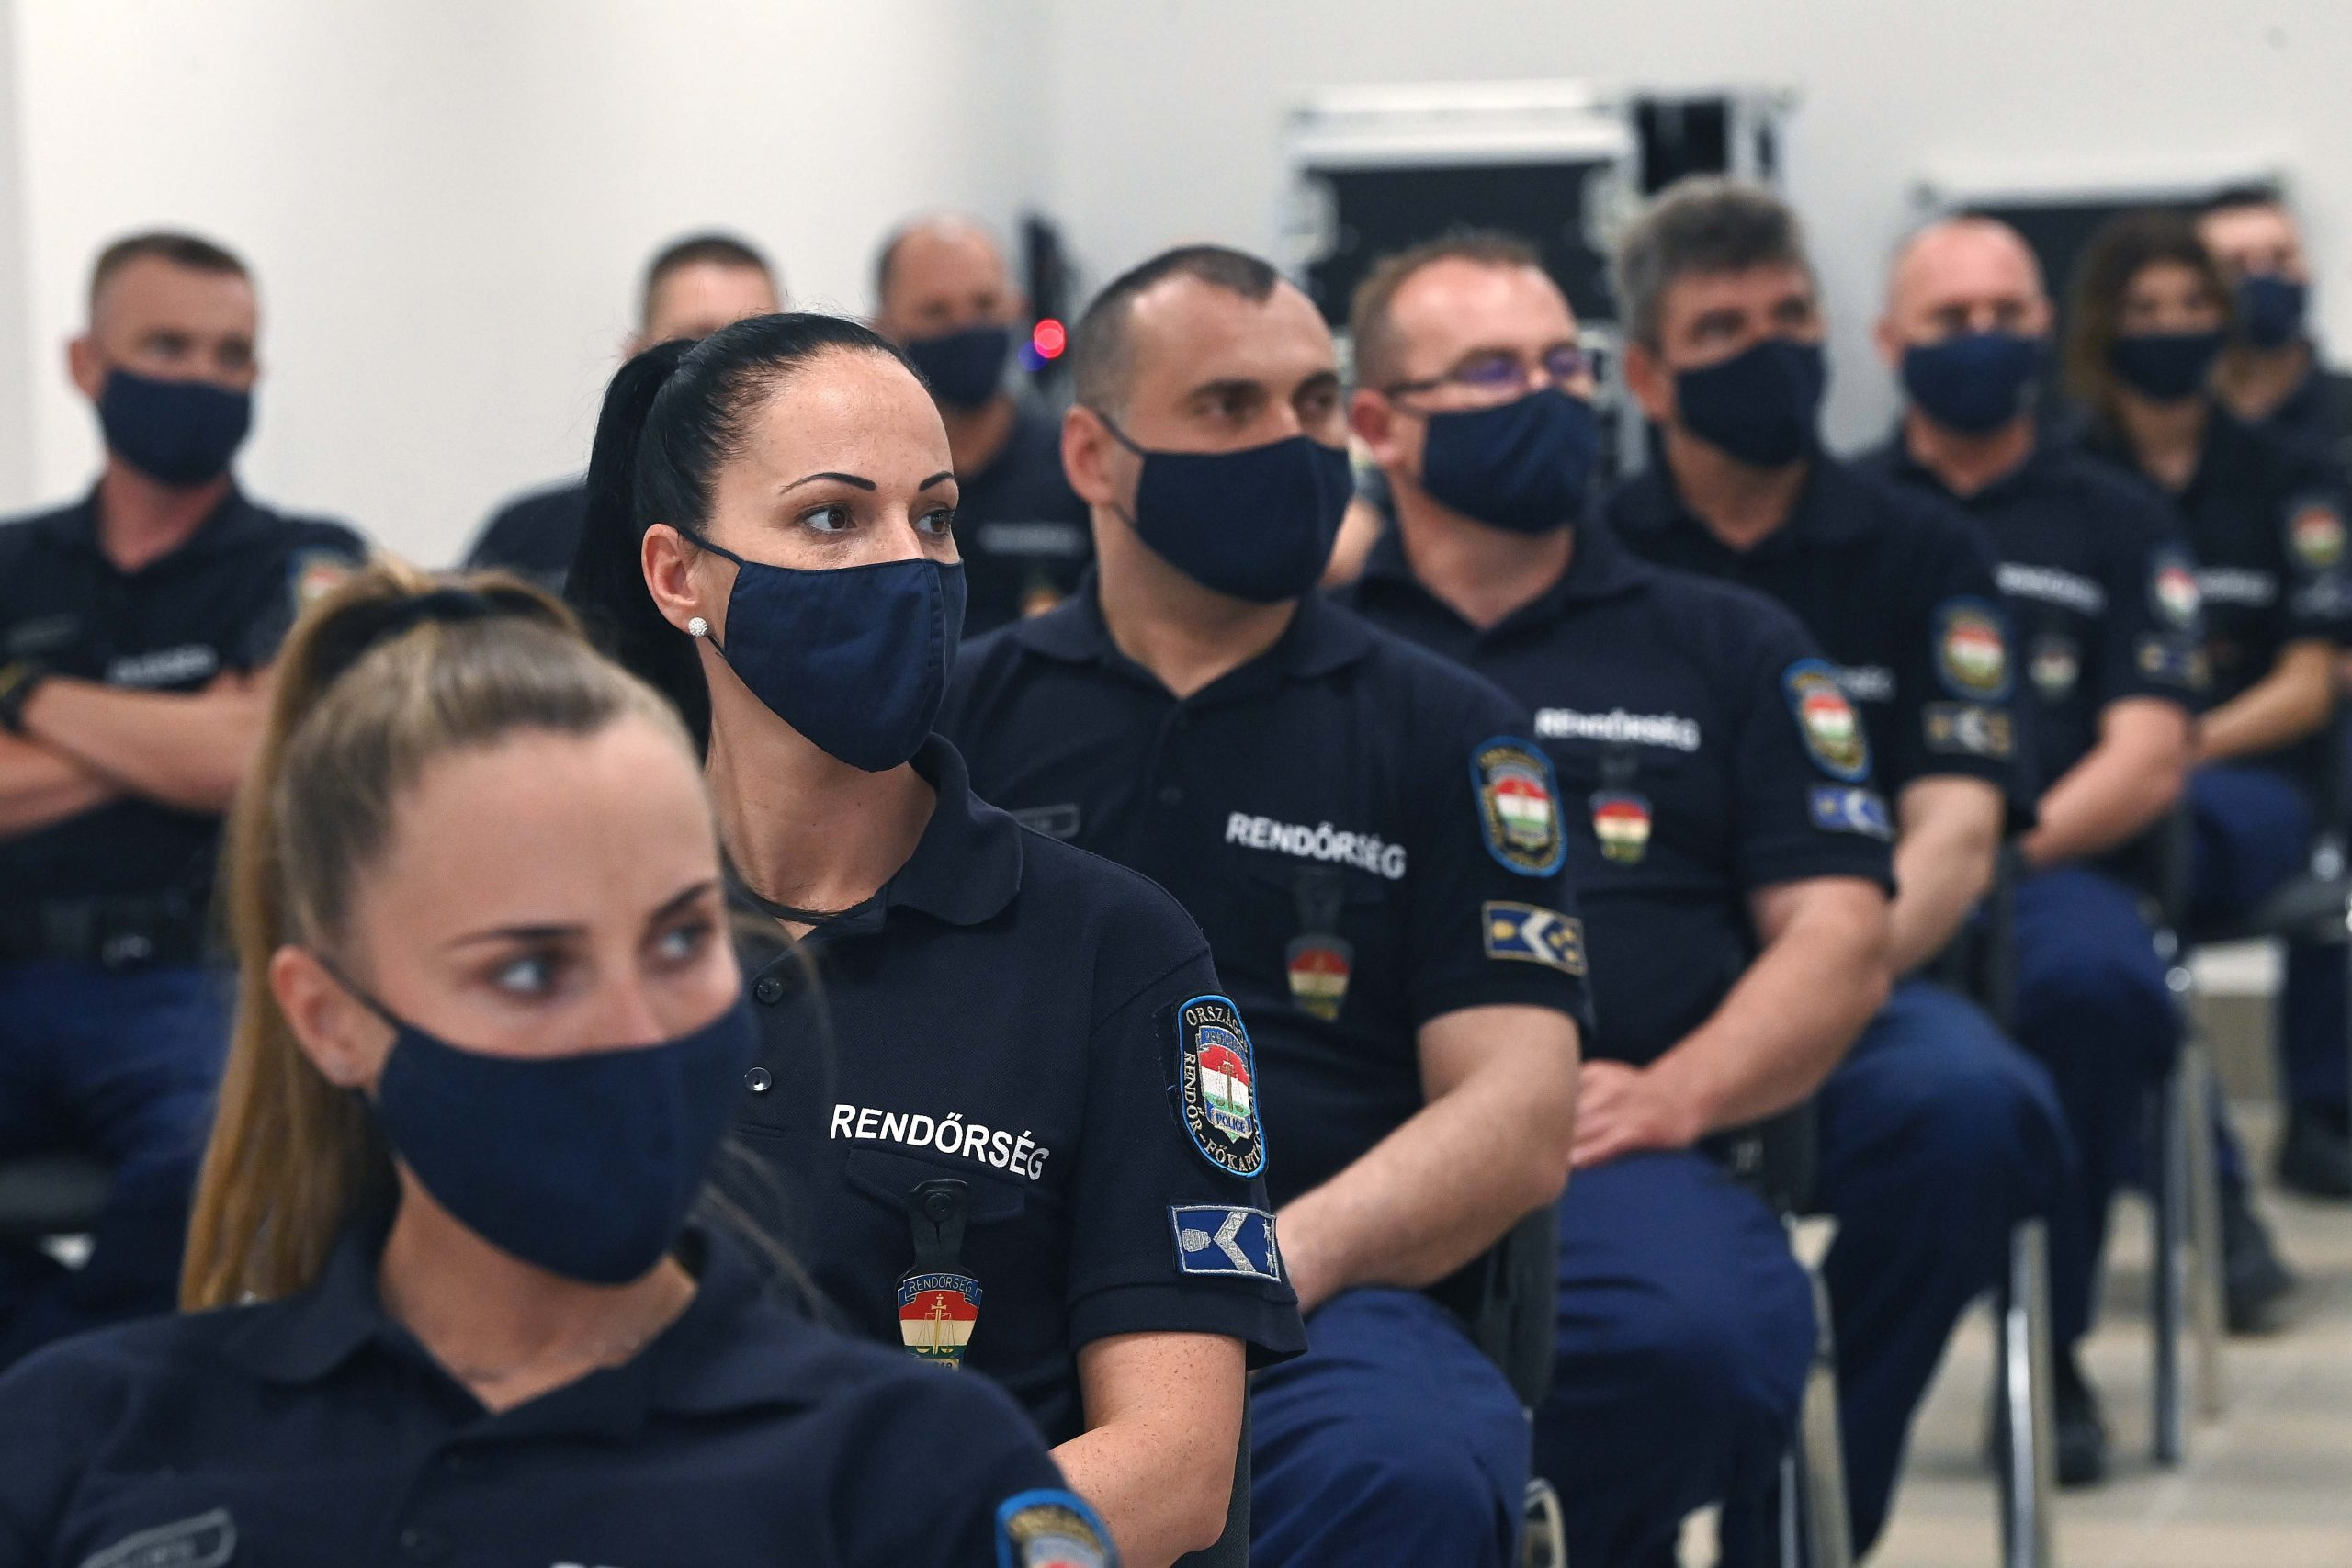 Hungary Sends Police Units to Serbia and North Macedonia